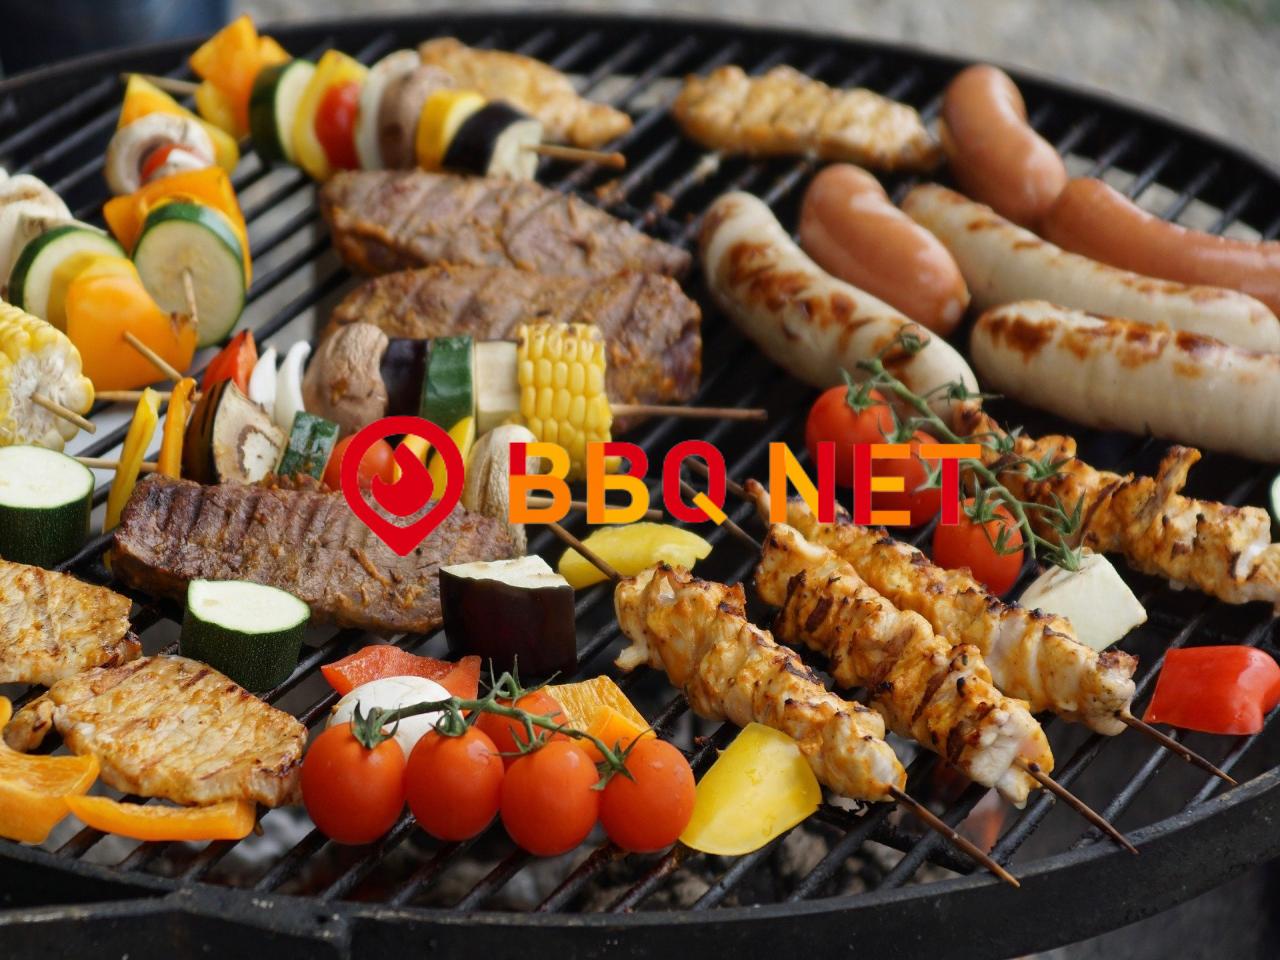 THE GELANDE BBQ iNAWASHiRO|猪苗代